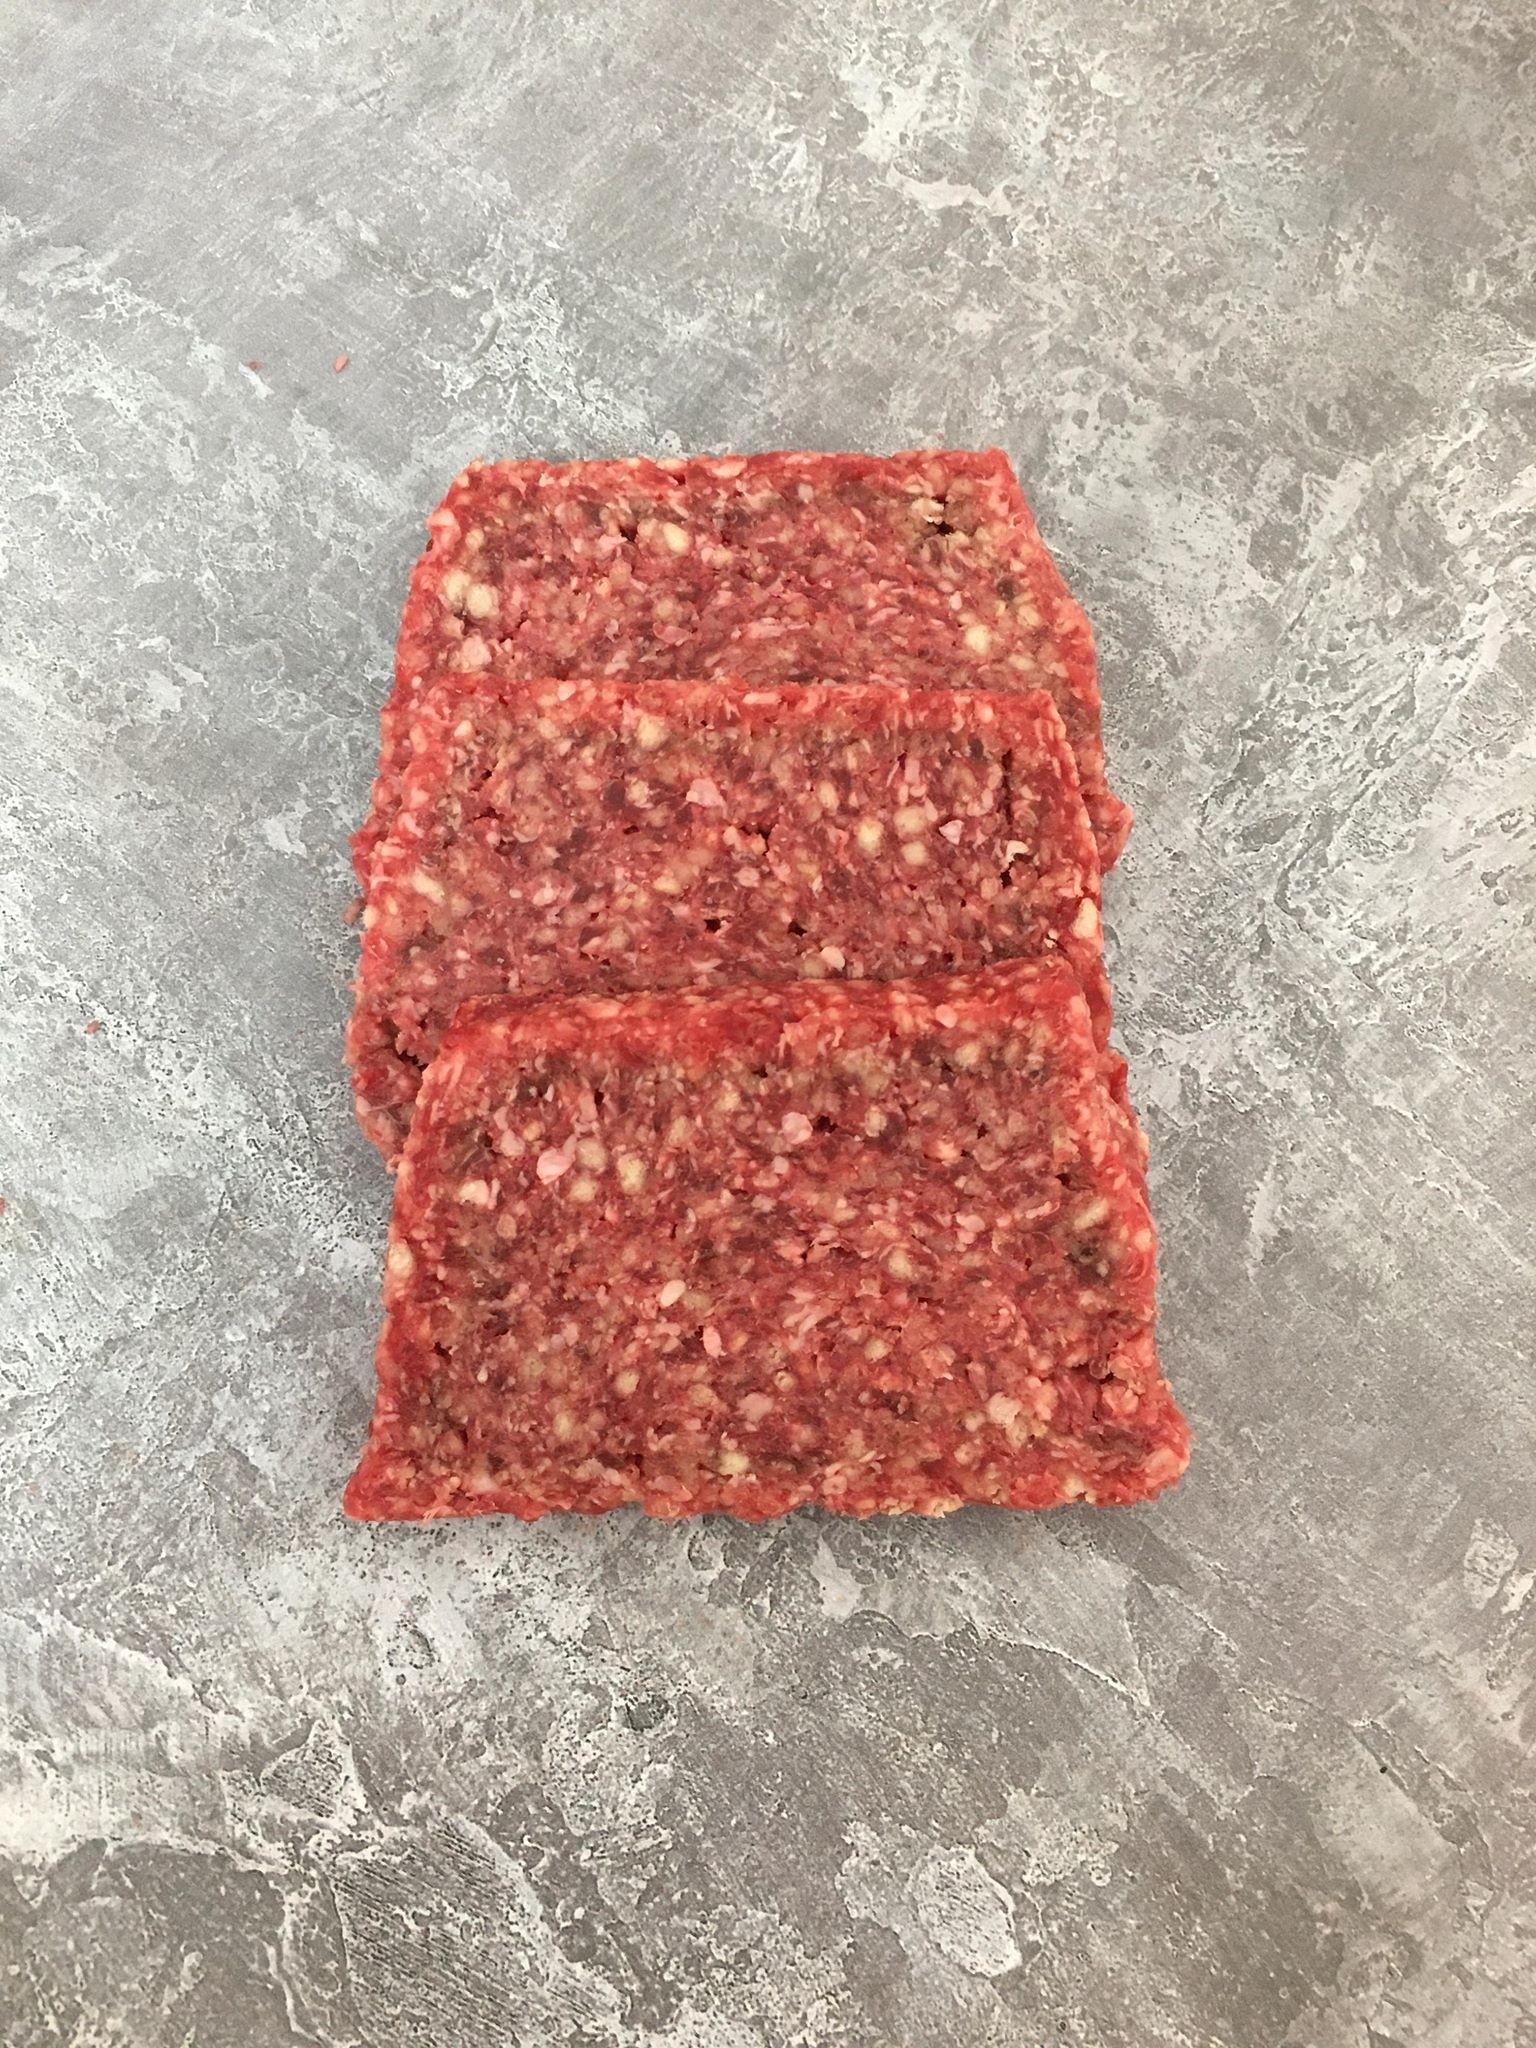 Steak Sliced Sausage